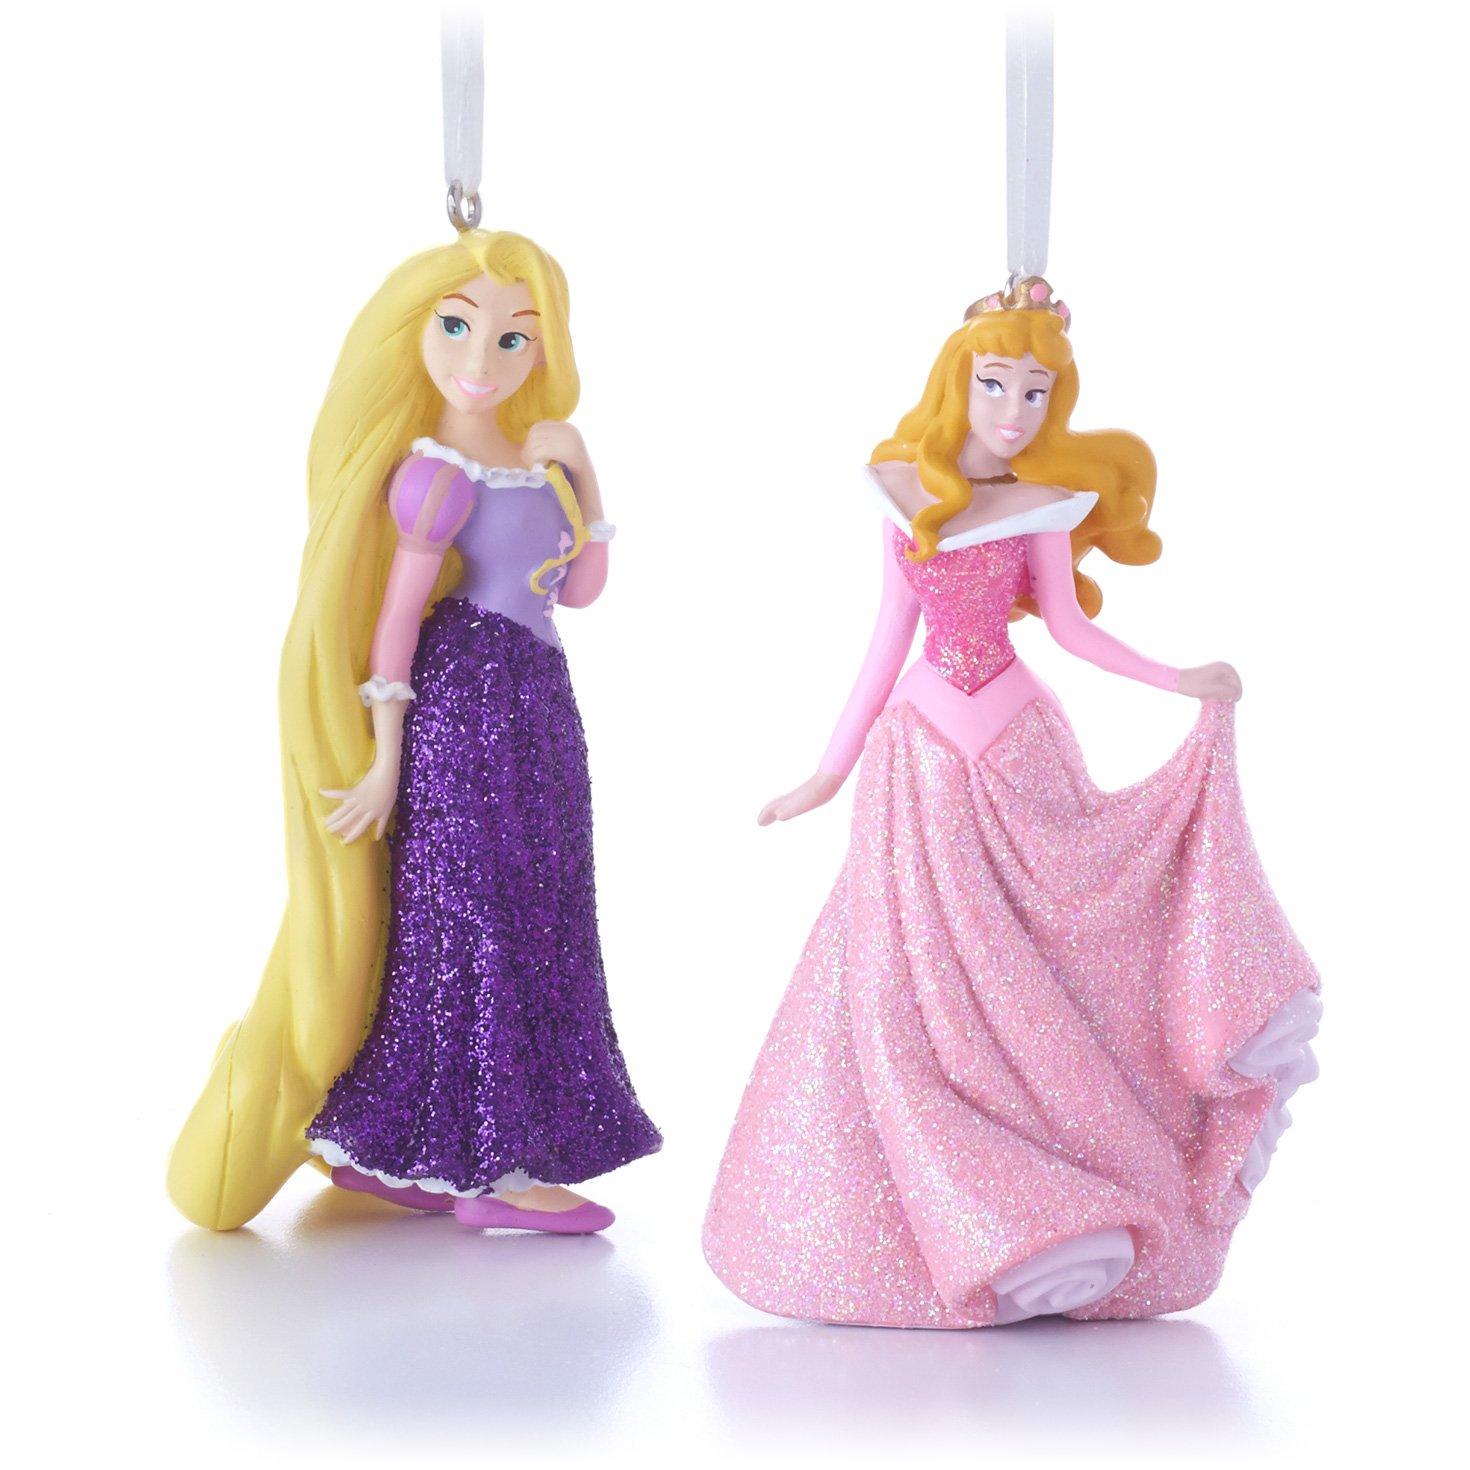 Hallmark Disney Rapunzel and Aurora Christmas Ornaments, Set of 2